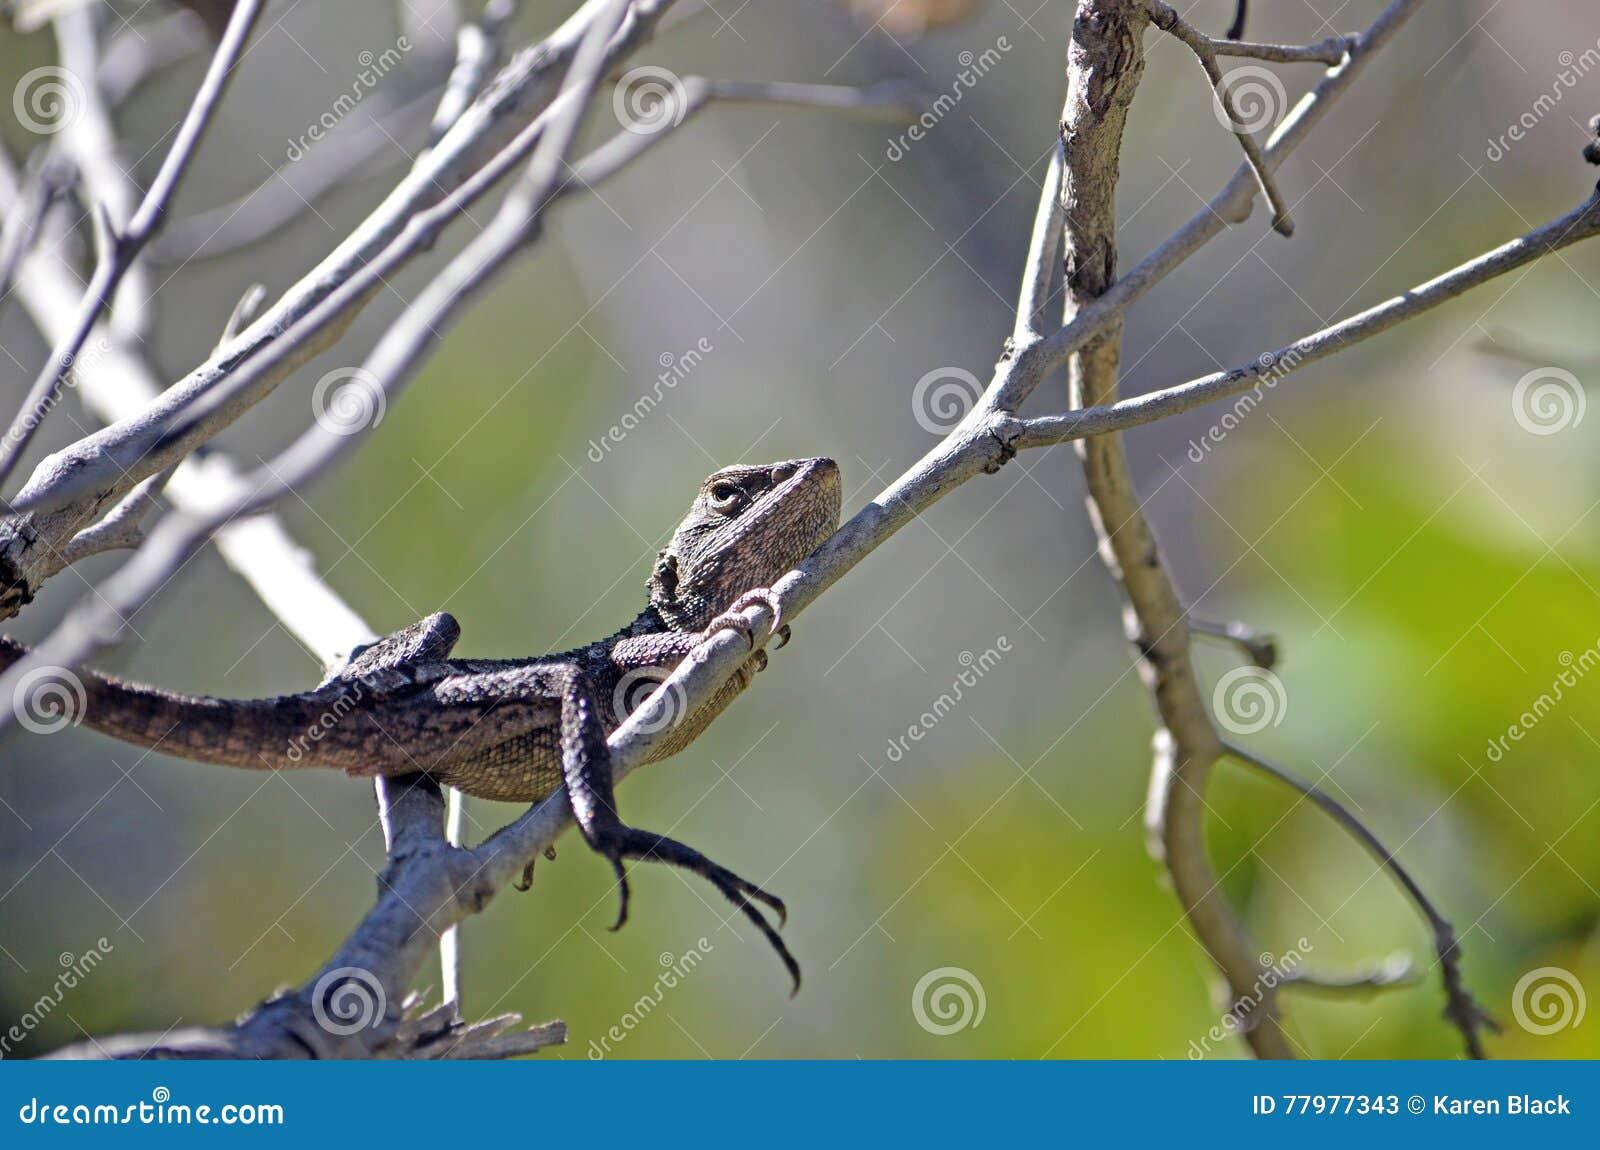 Australian Native Jacky Dragon Lizard In Tree Stock Image Image Of